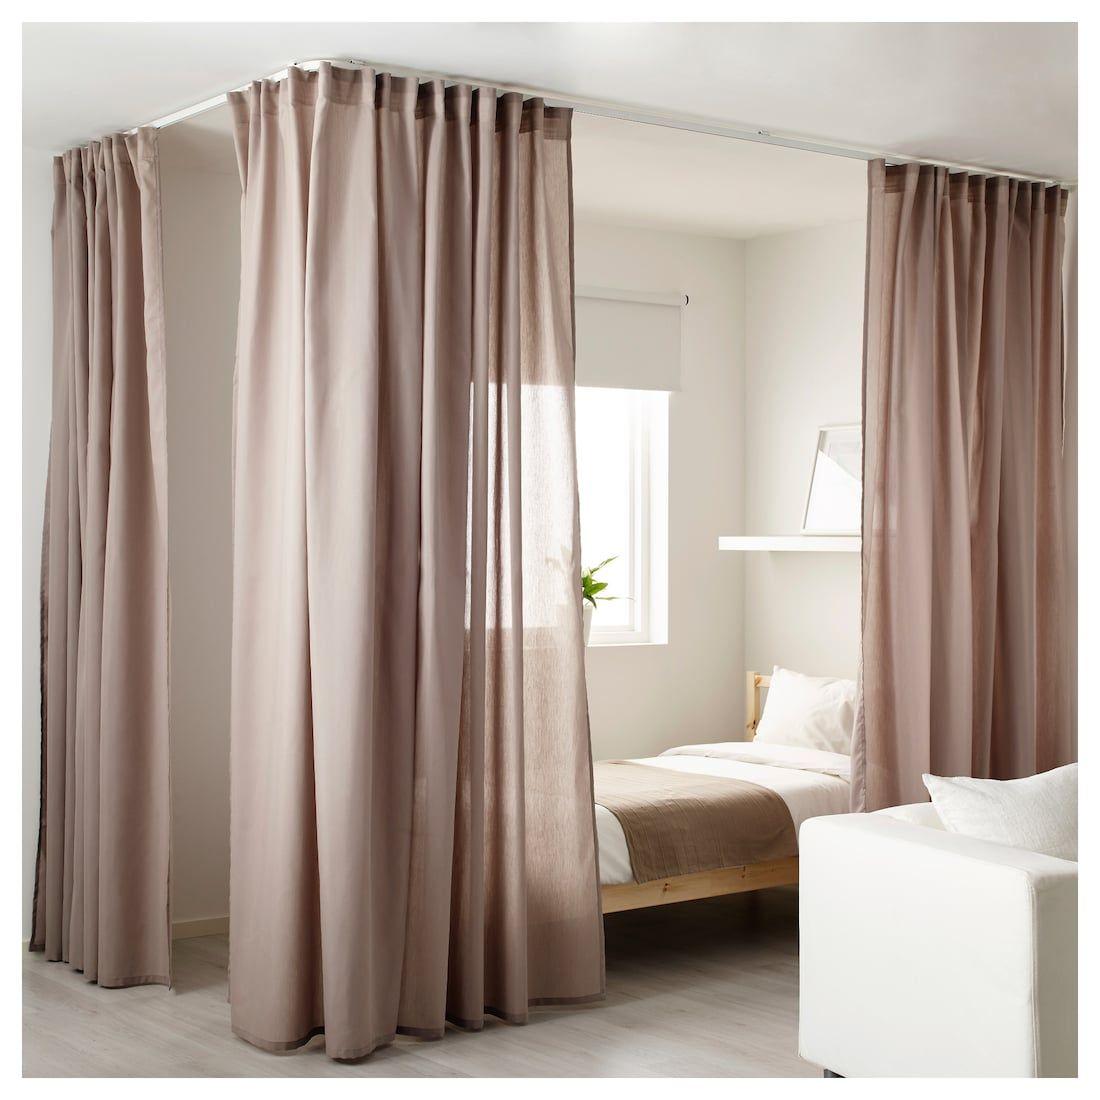 Ikea Vidga White Corner Room Divider Room Divider Curtain Small